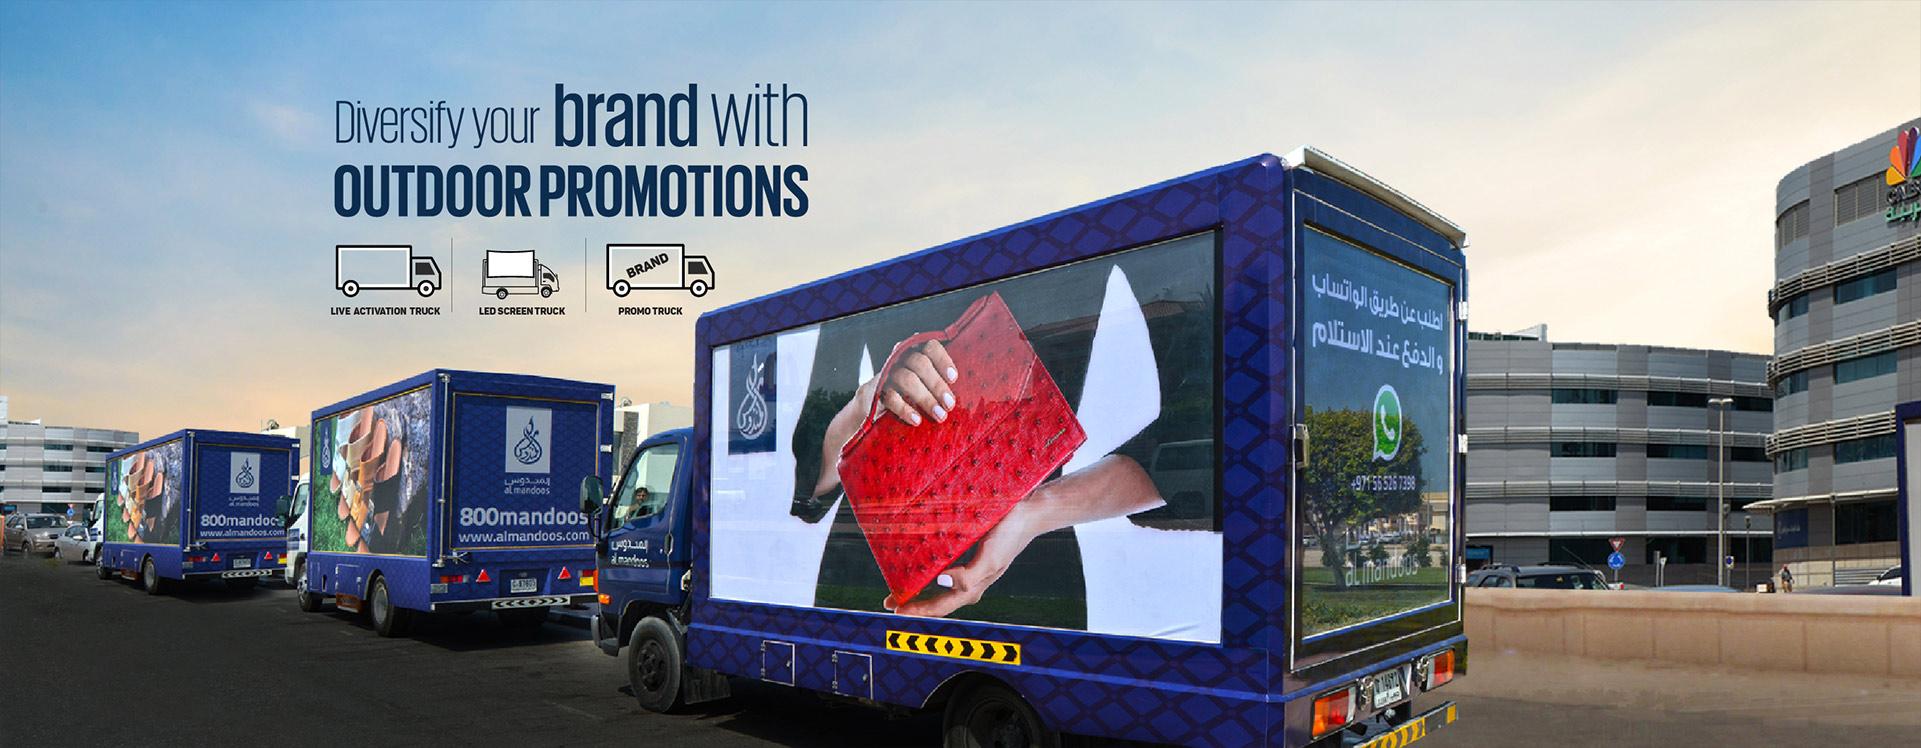 Mobile truck advertising in Dubai, UAE